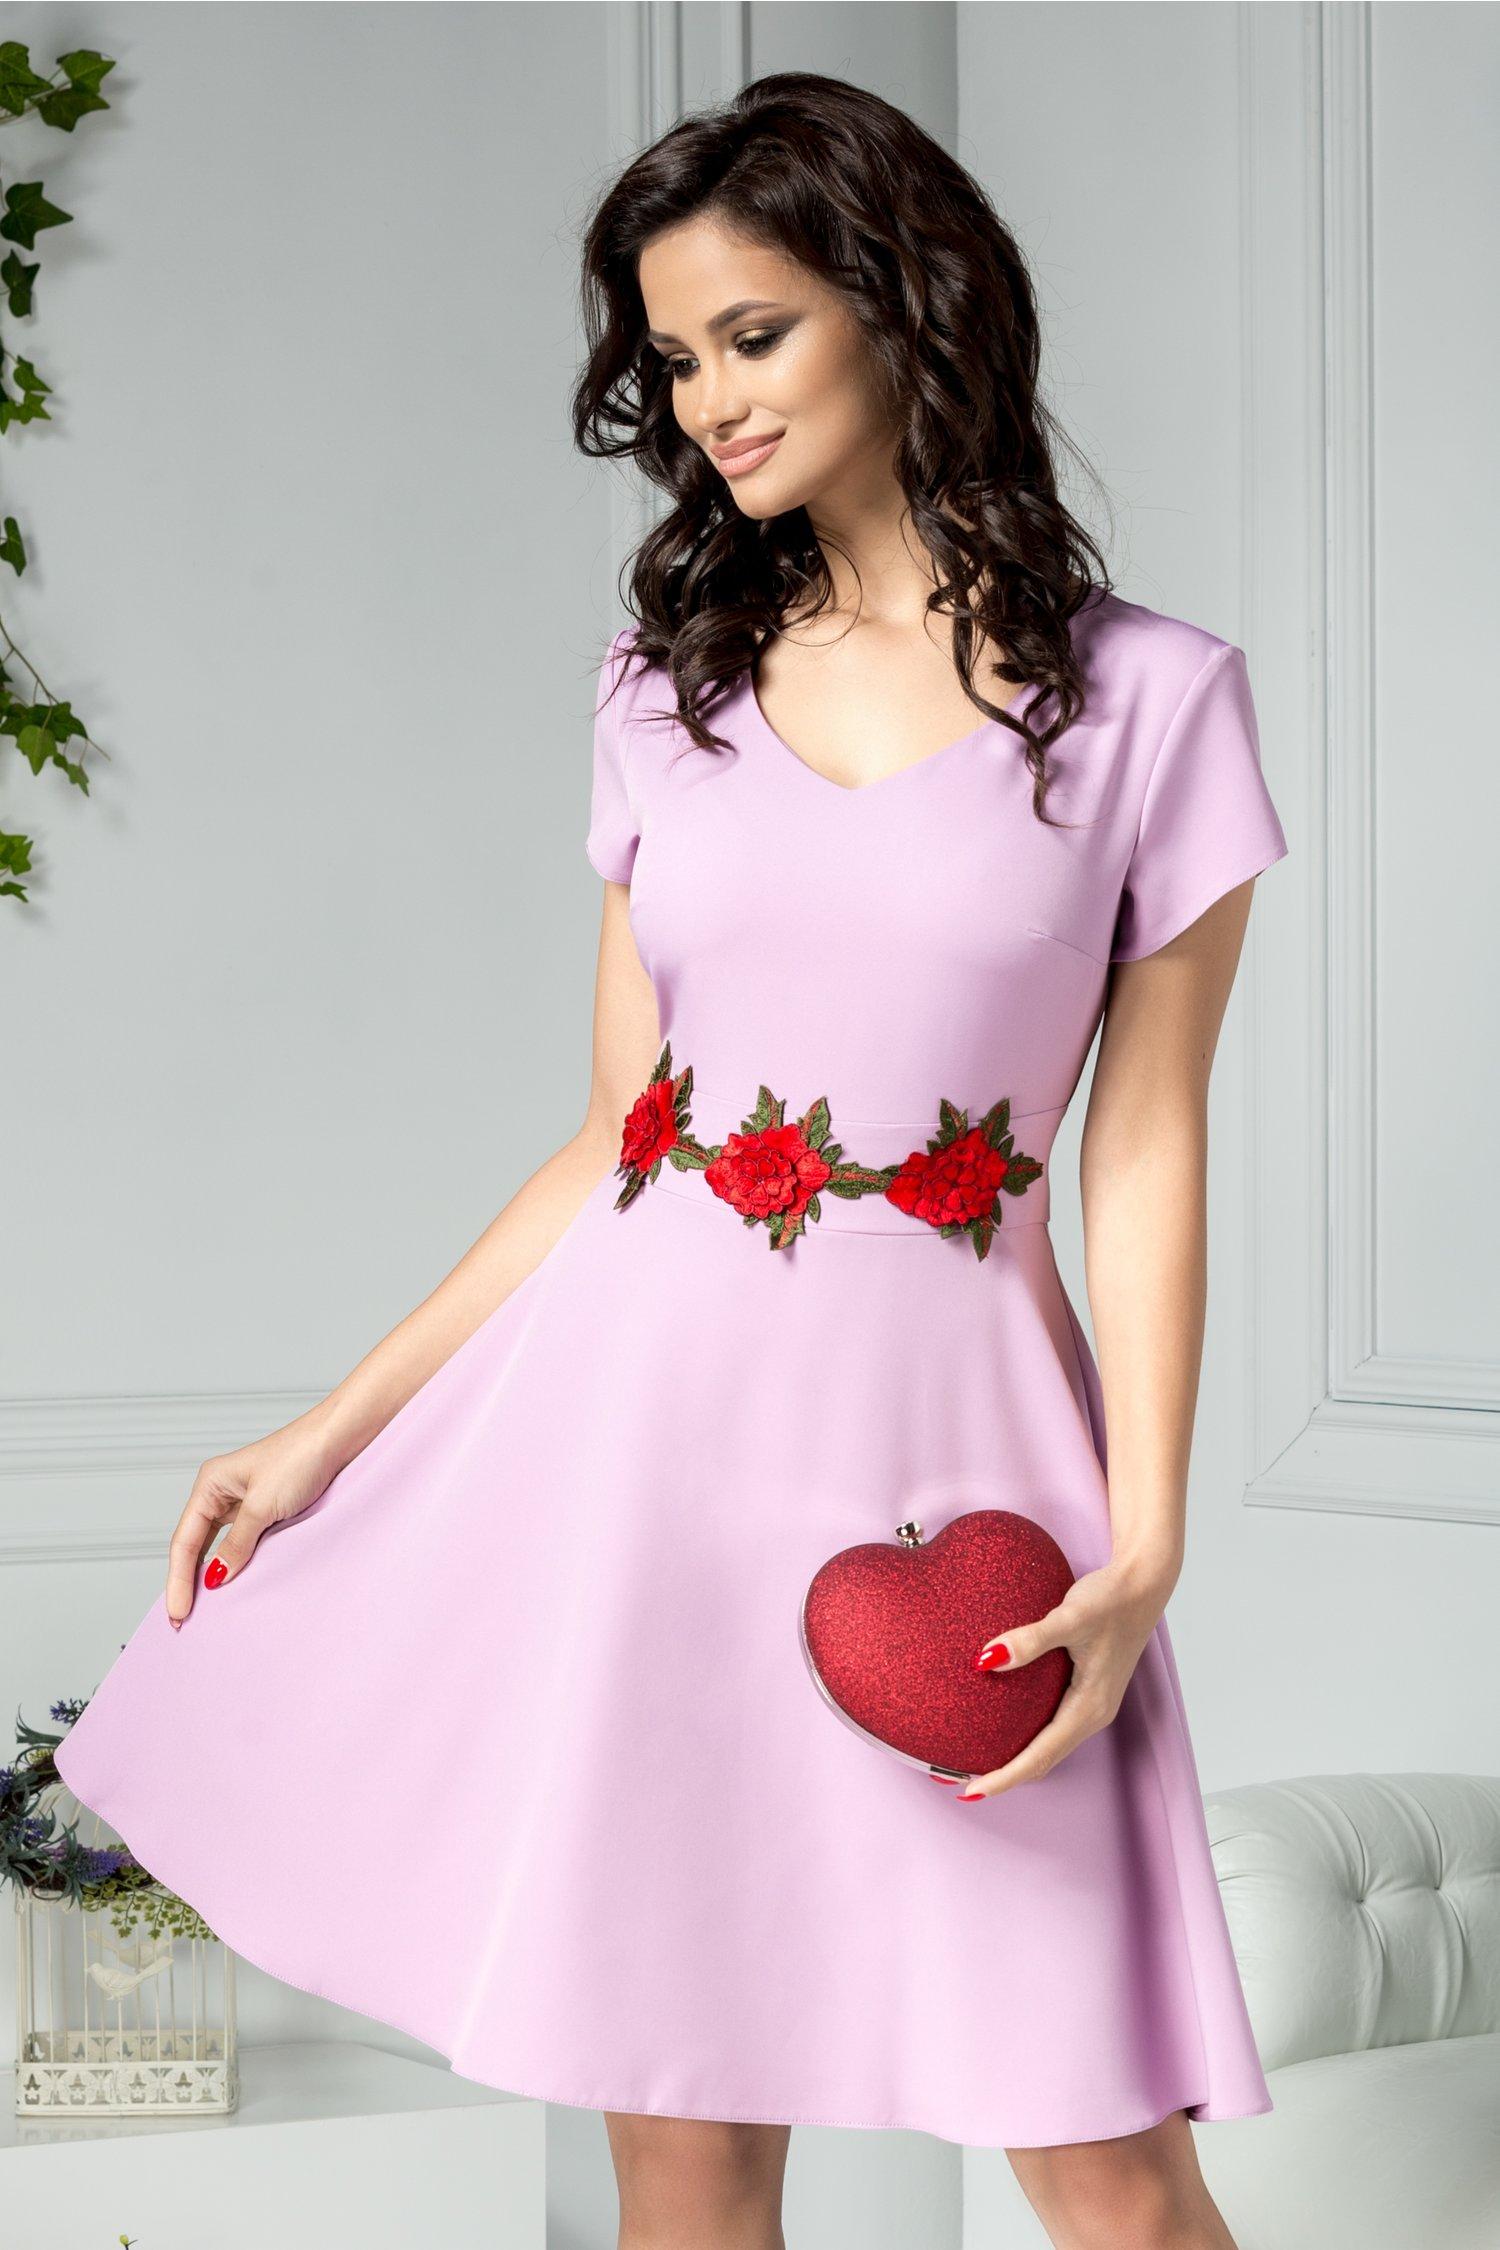 Rochie Gladys lila cu trandafiri in talie